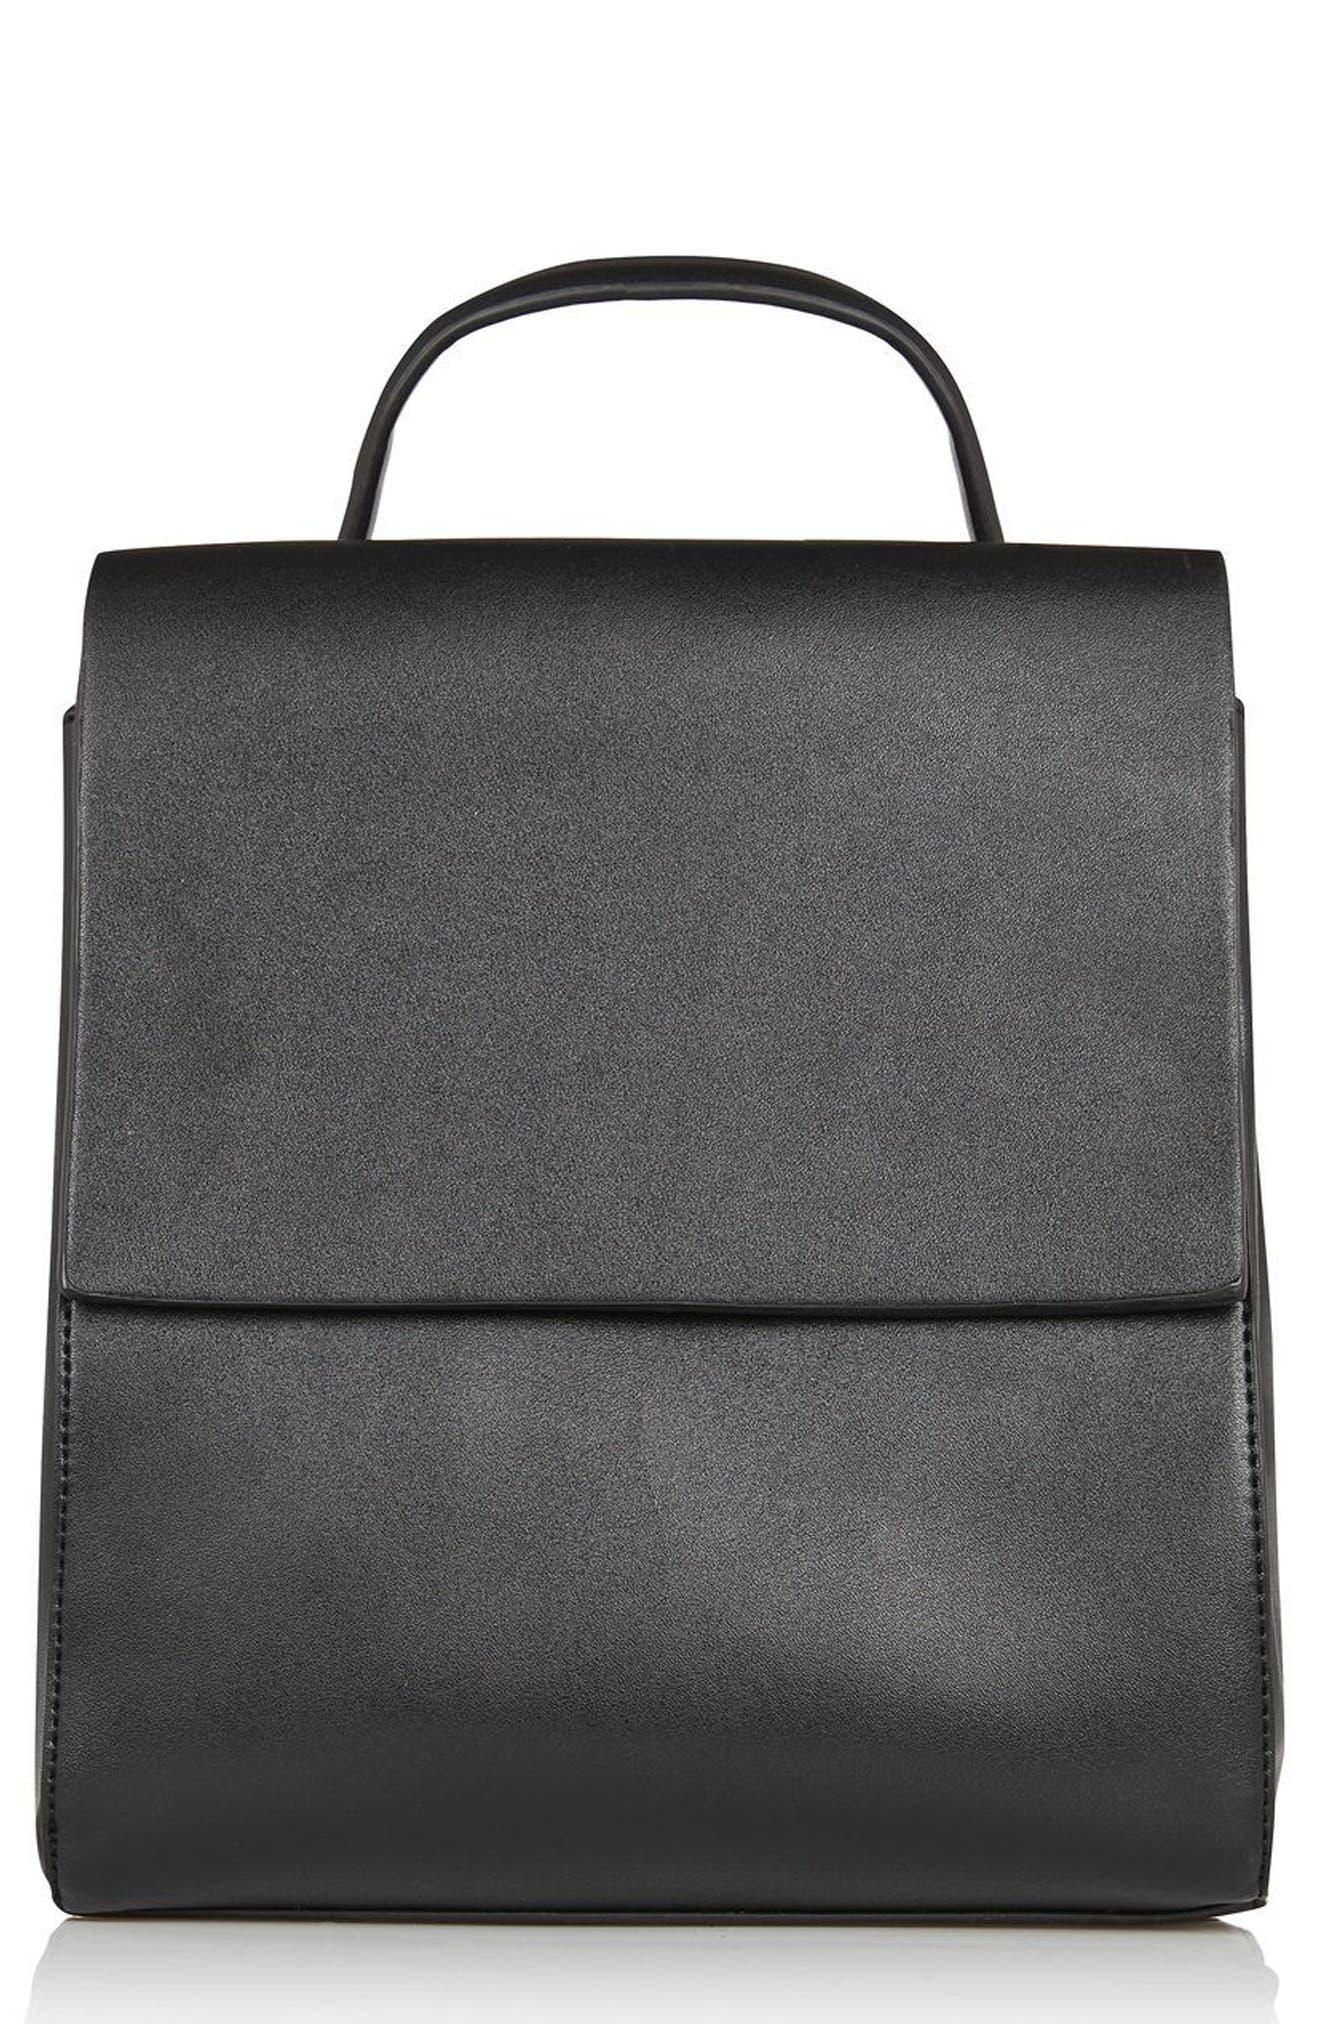 Topshop Mini Scandi Faux Leather Backpack